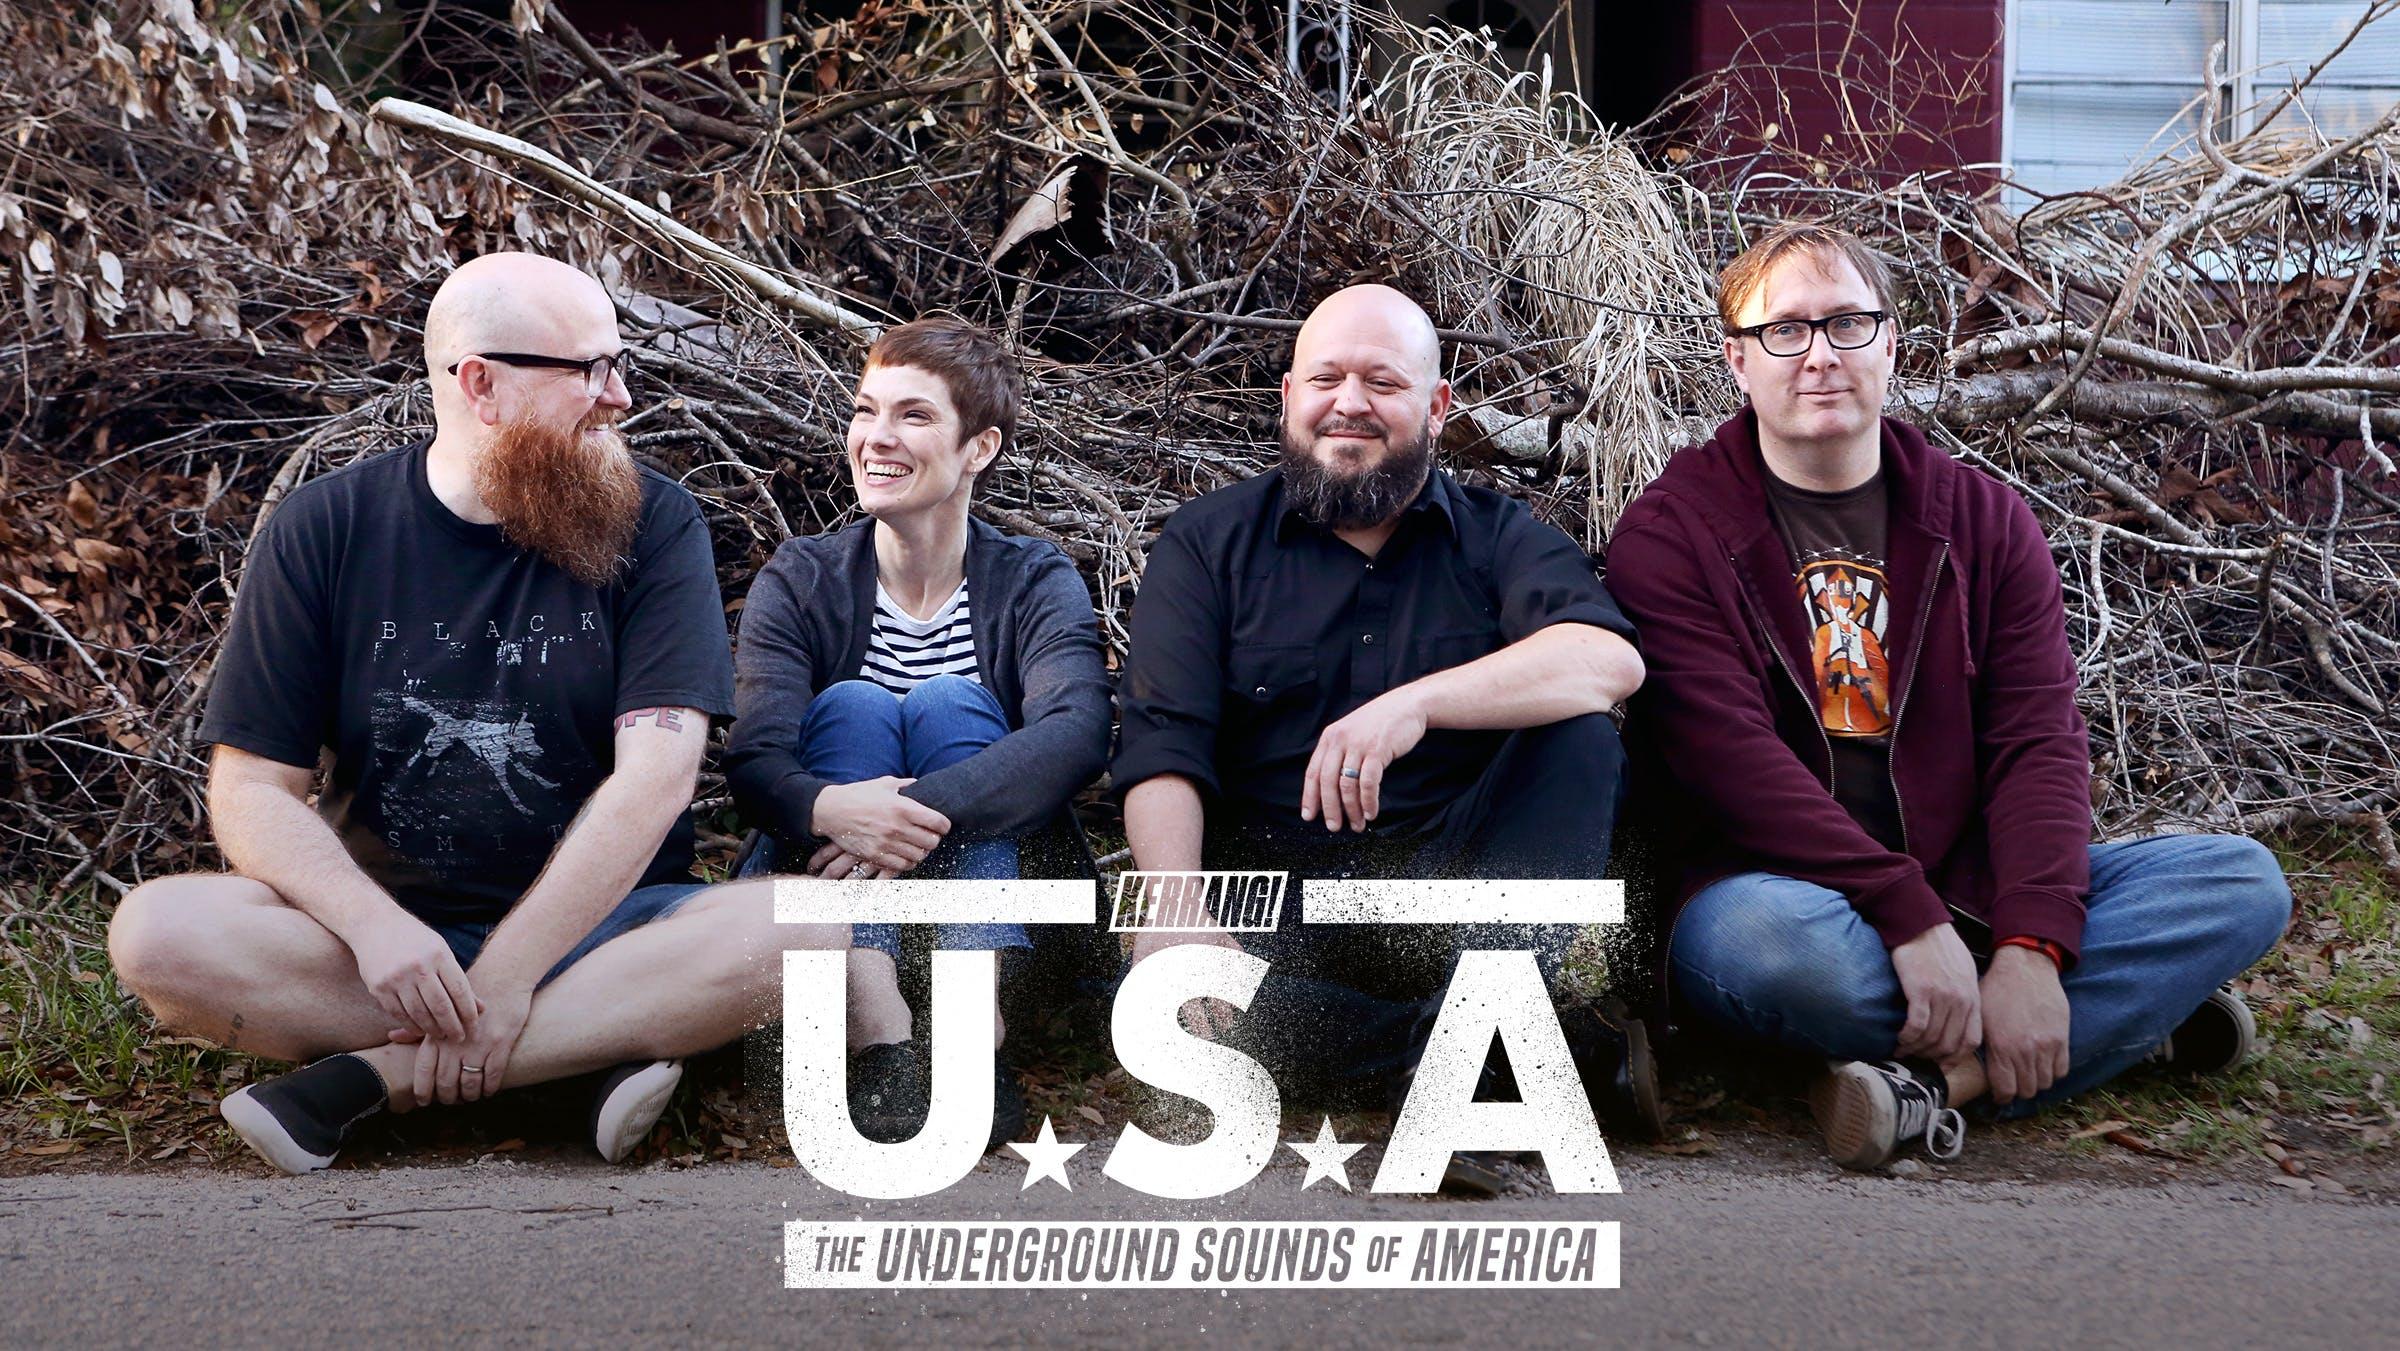 The Underground Sounds of America: Pohgoh